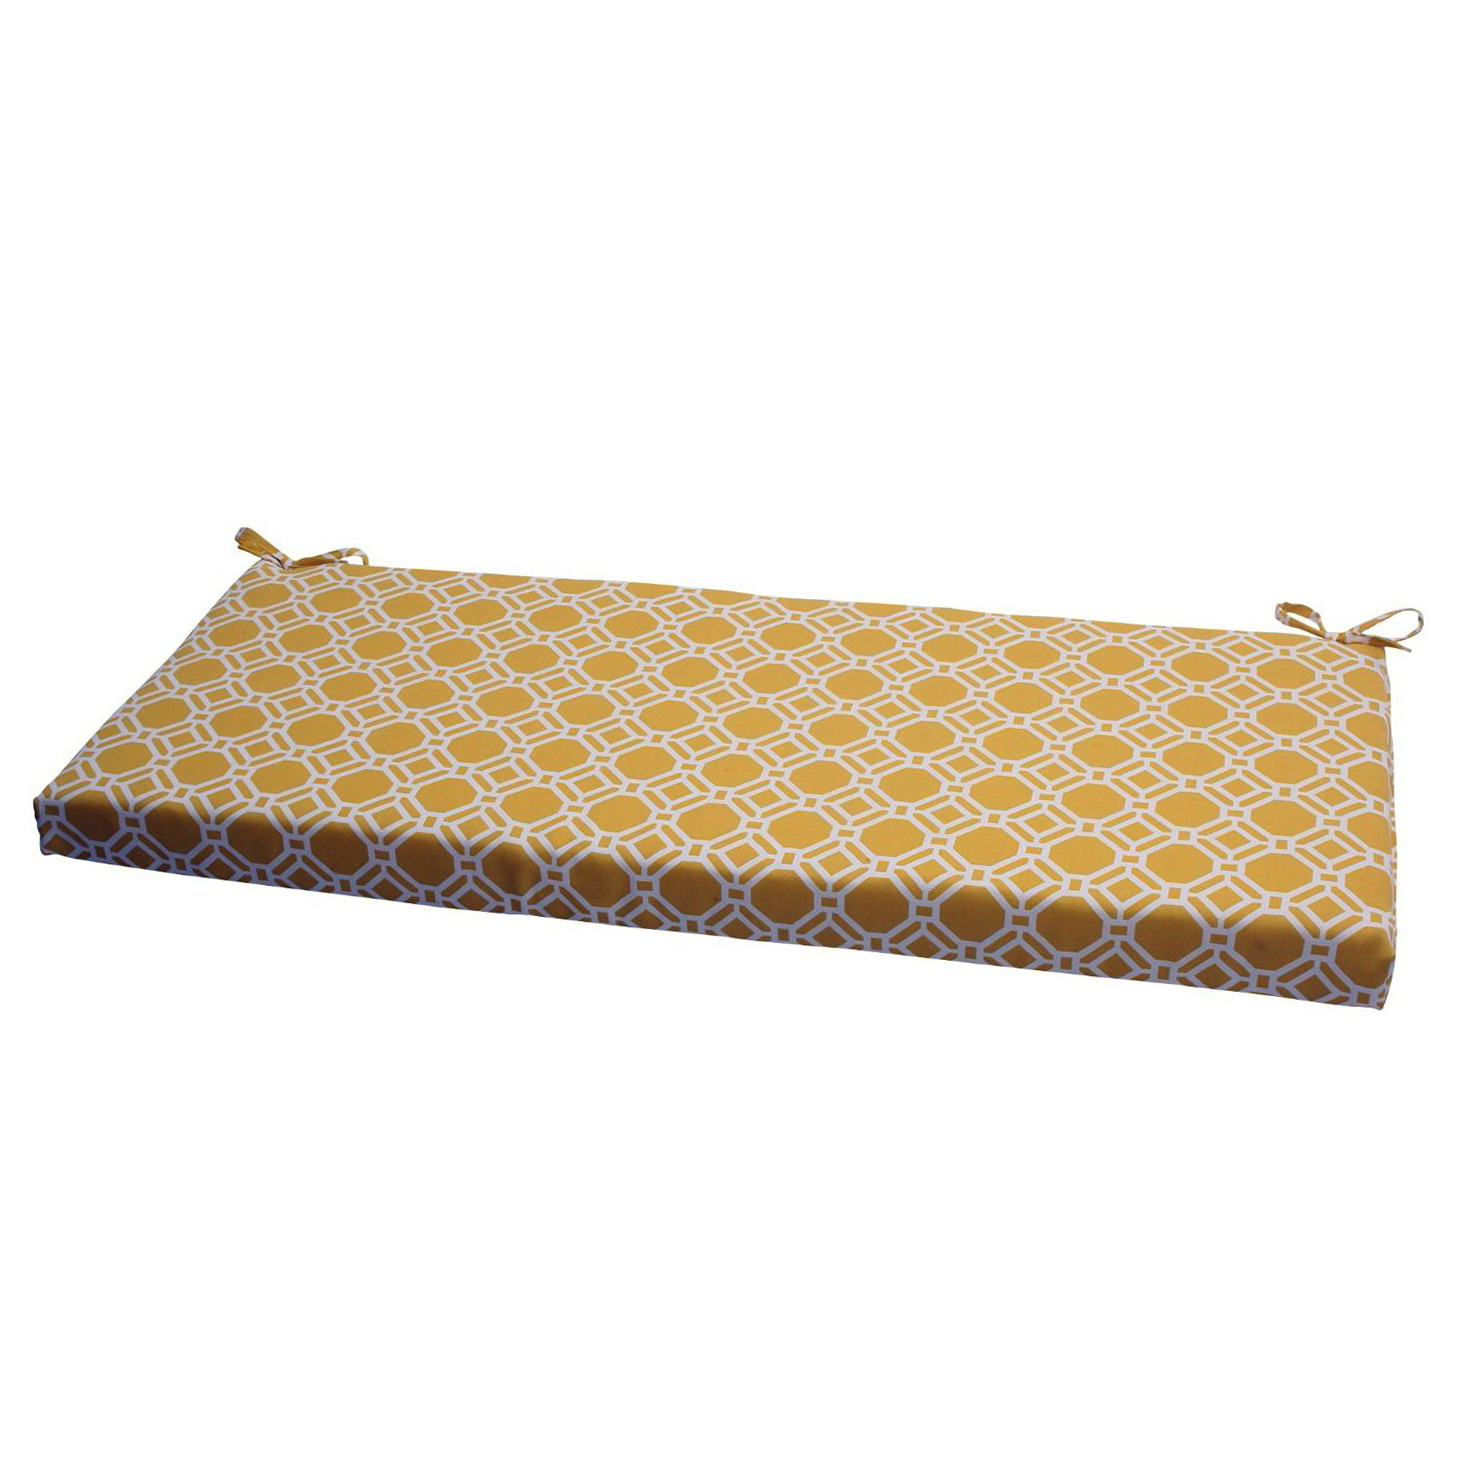 Tar Outdoor Cushions Pillows